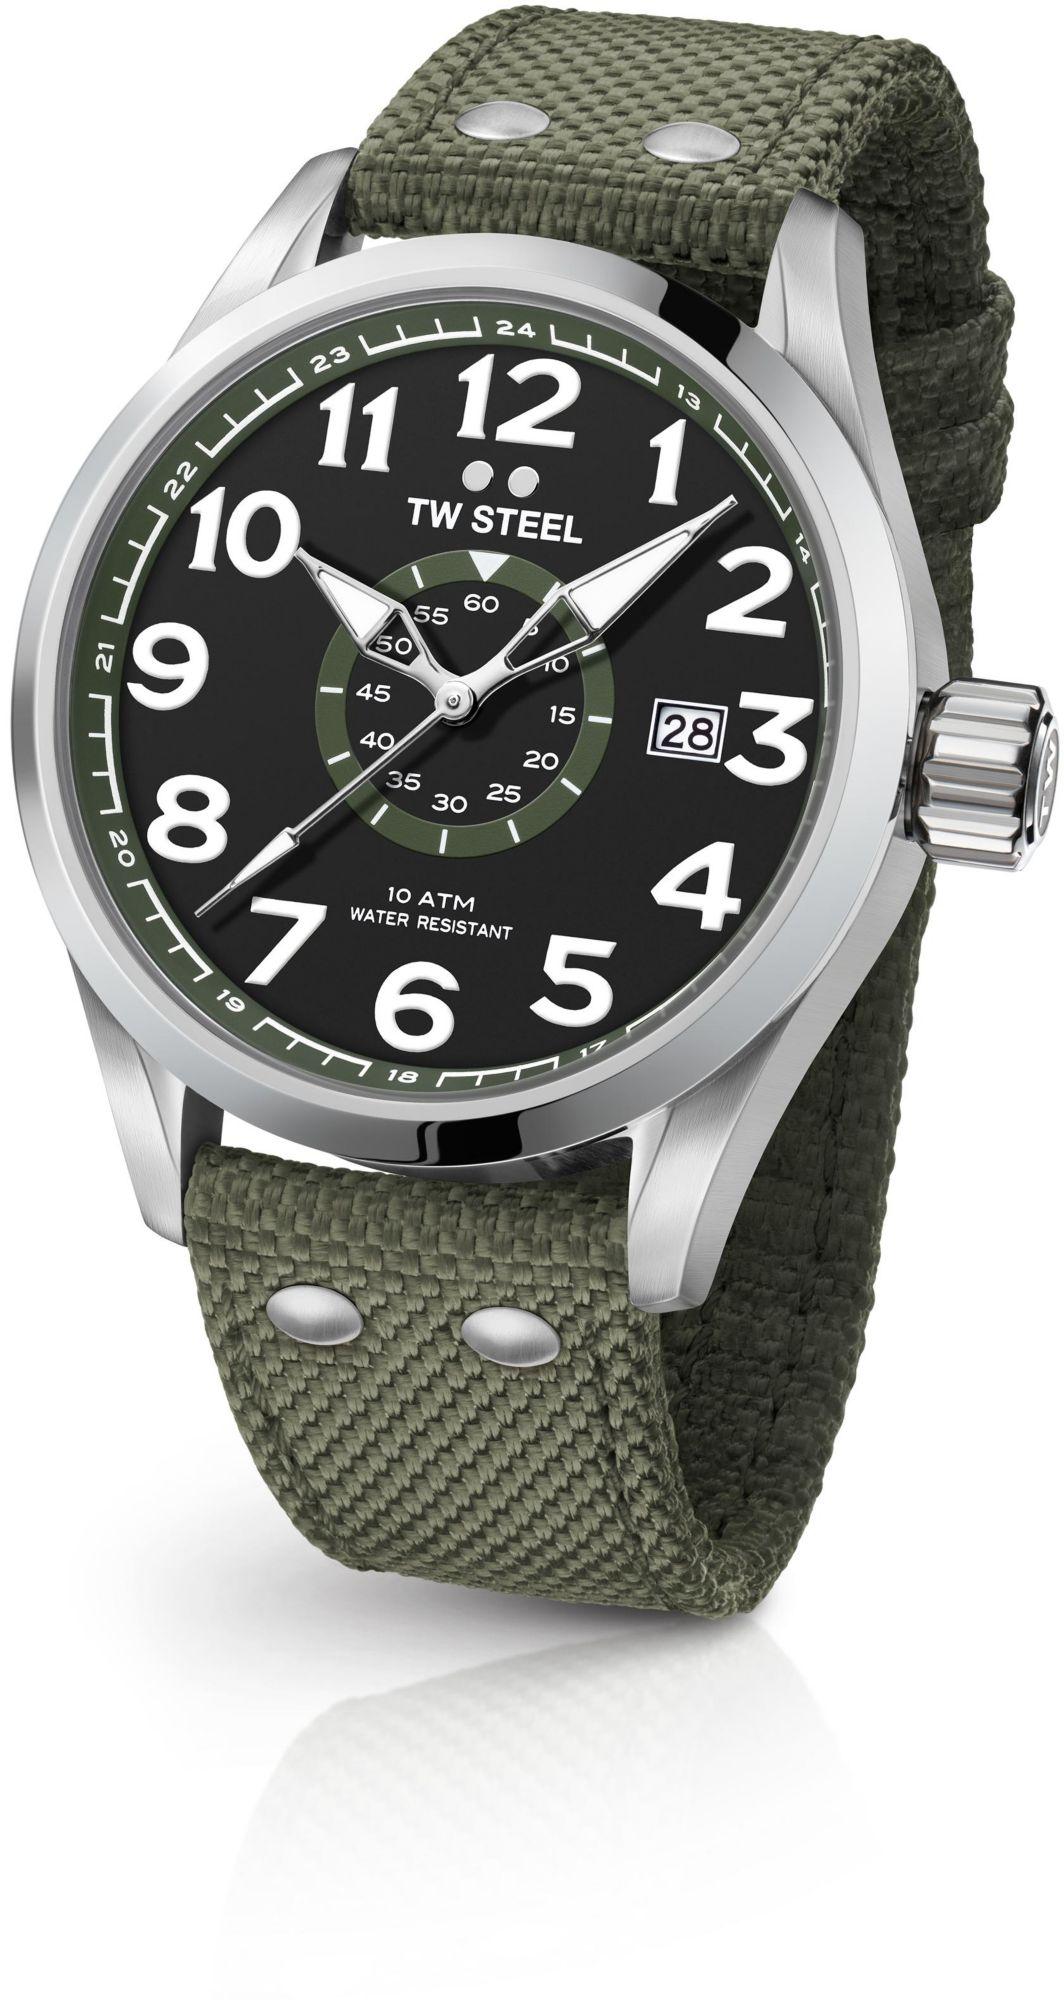 TW STEEL -Uhr TW Steel Oliv